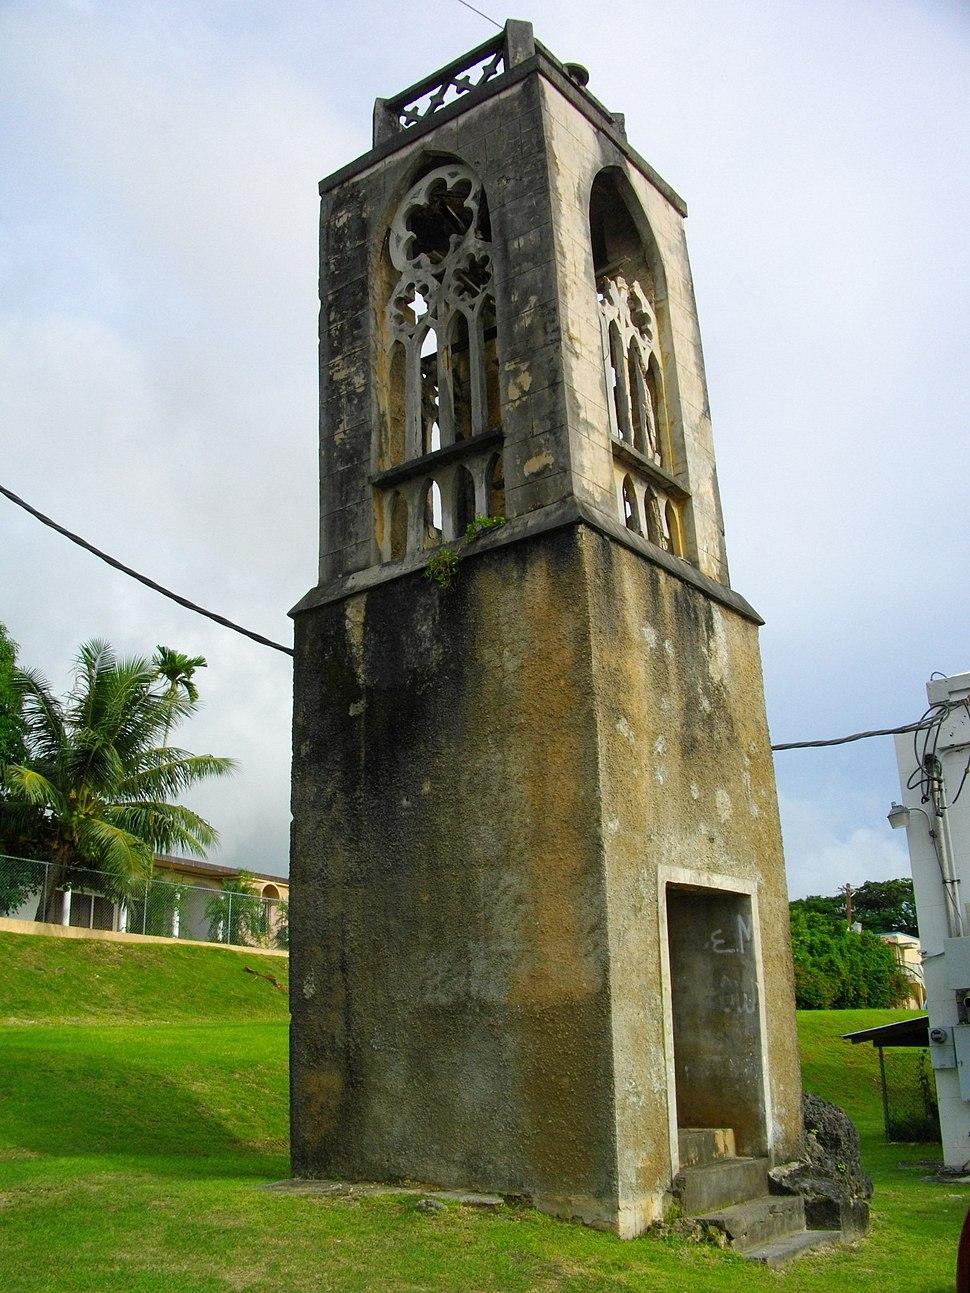 Old Spanish Church Tower